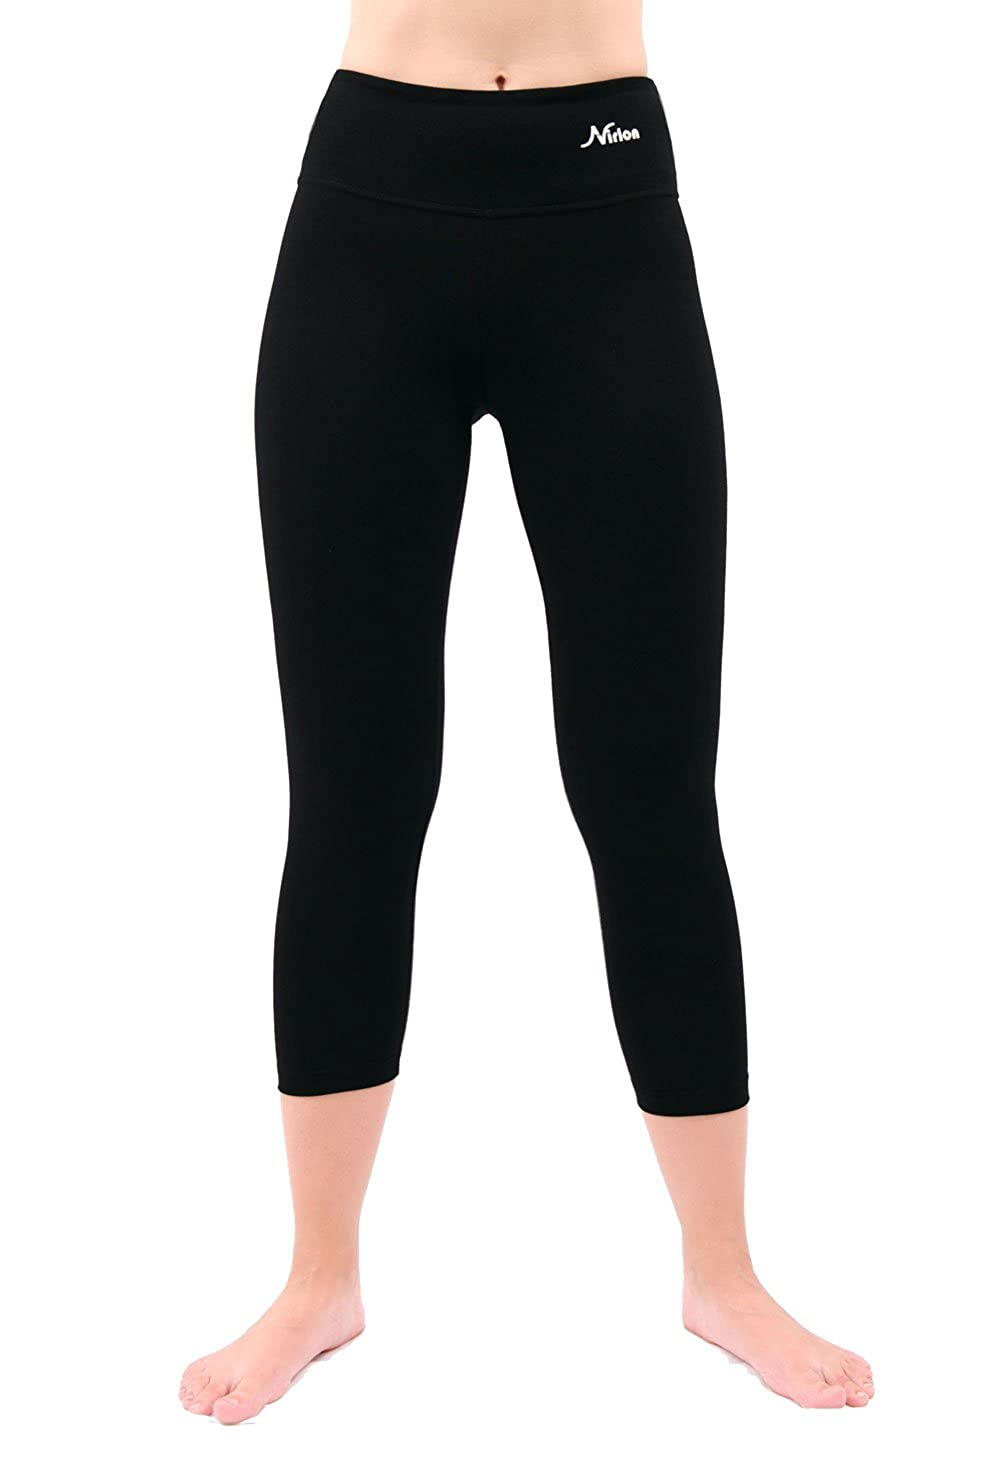 9a85575c5f1 Amazon.com  NIRLON Capri 7 8 Yoga Pants Capri s for Women Best Cropped  Leggings Athletic Running Jogging Workout   Sport Cotton Spandex  Clothing